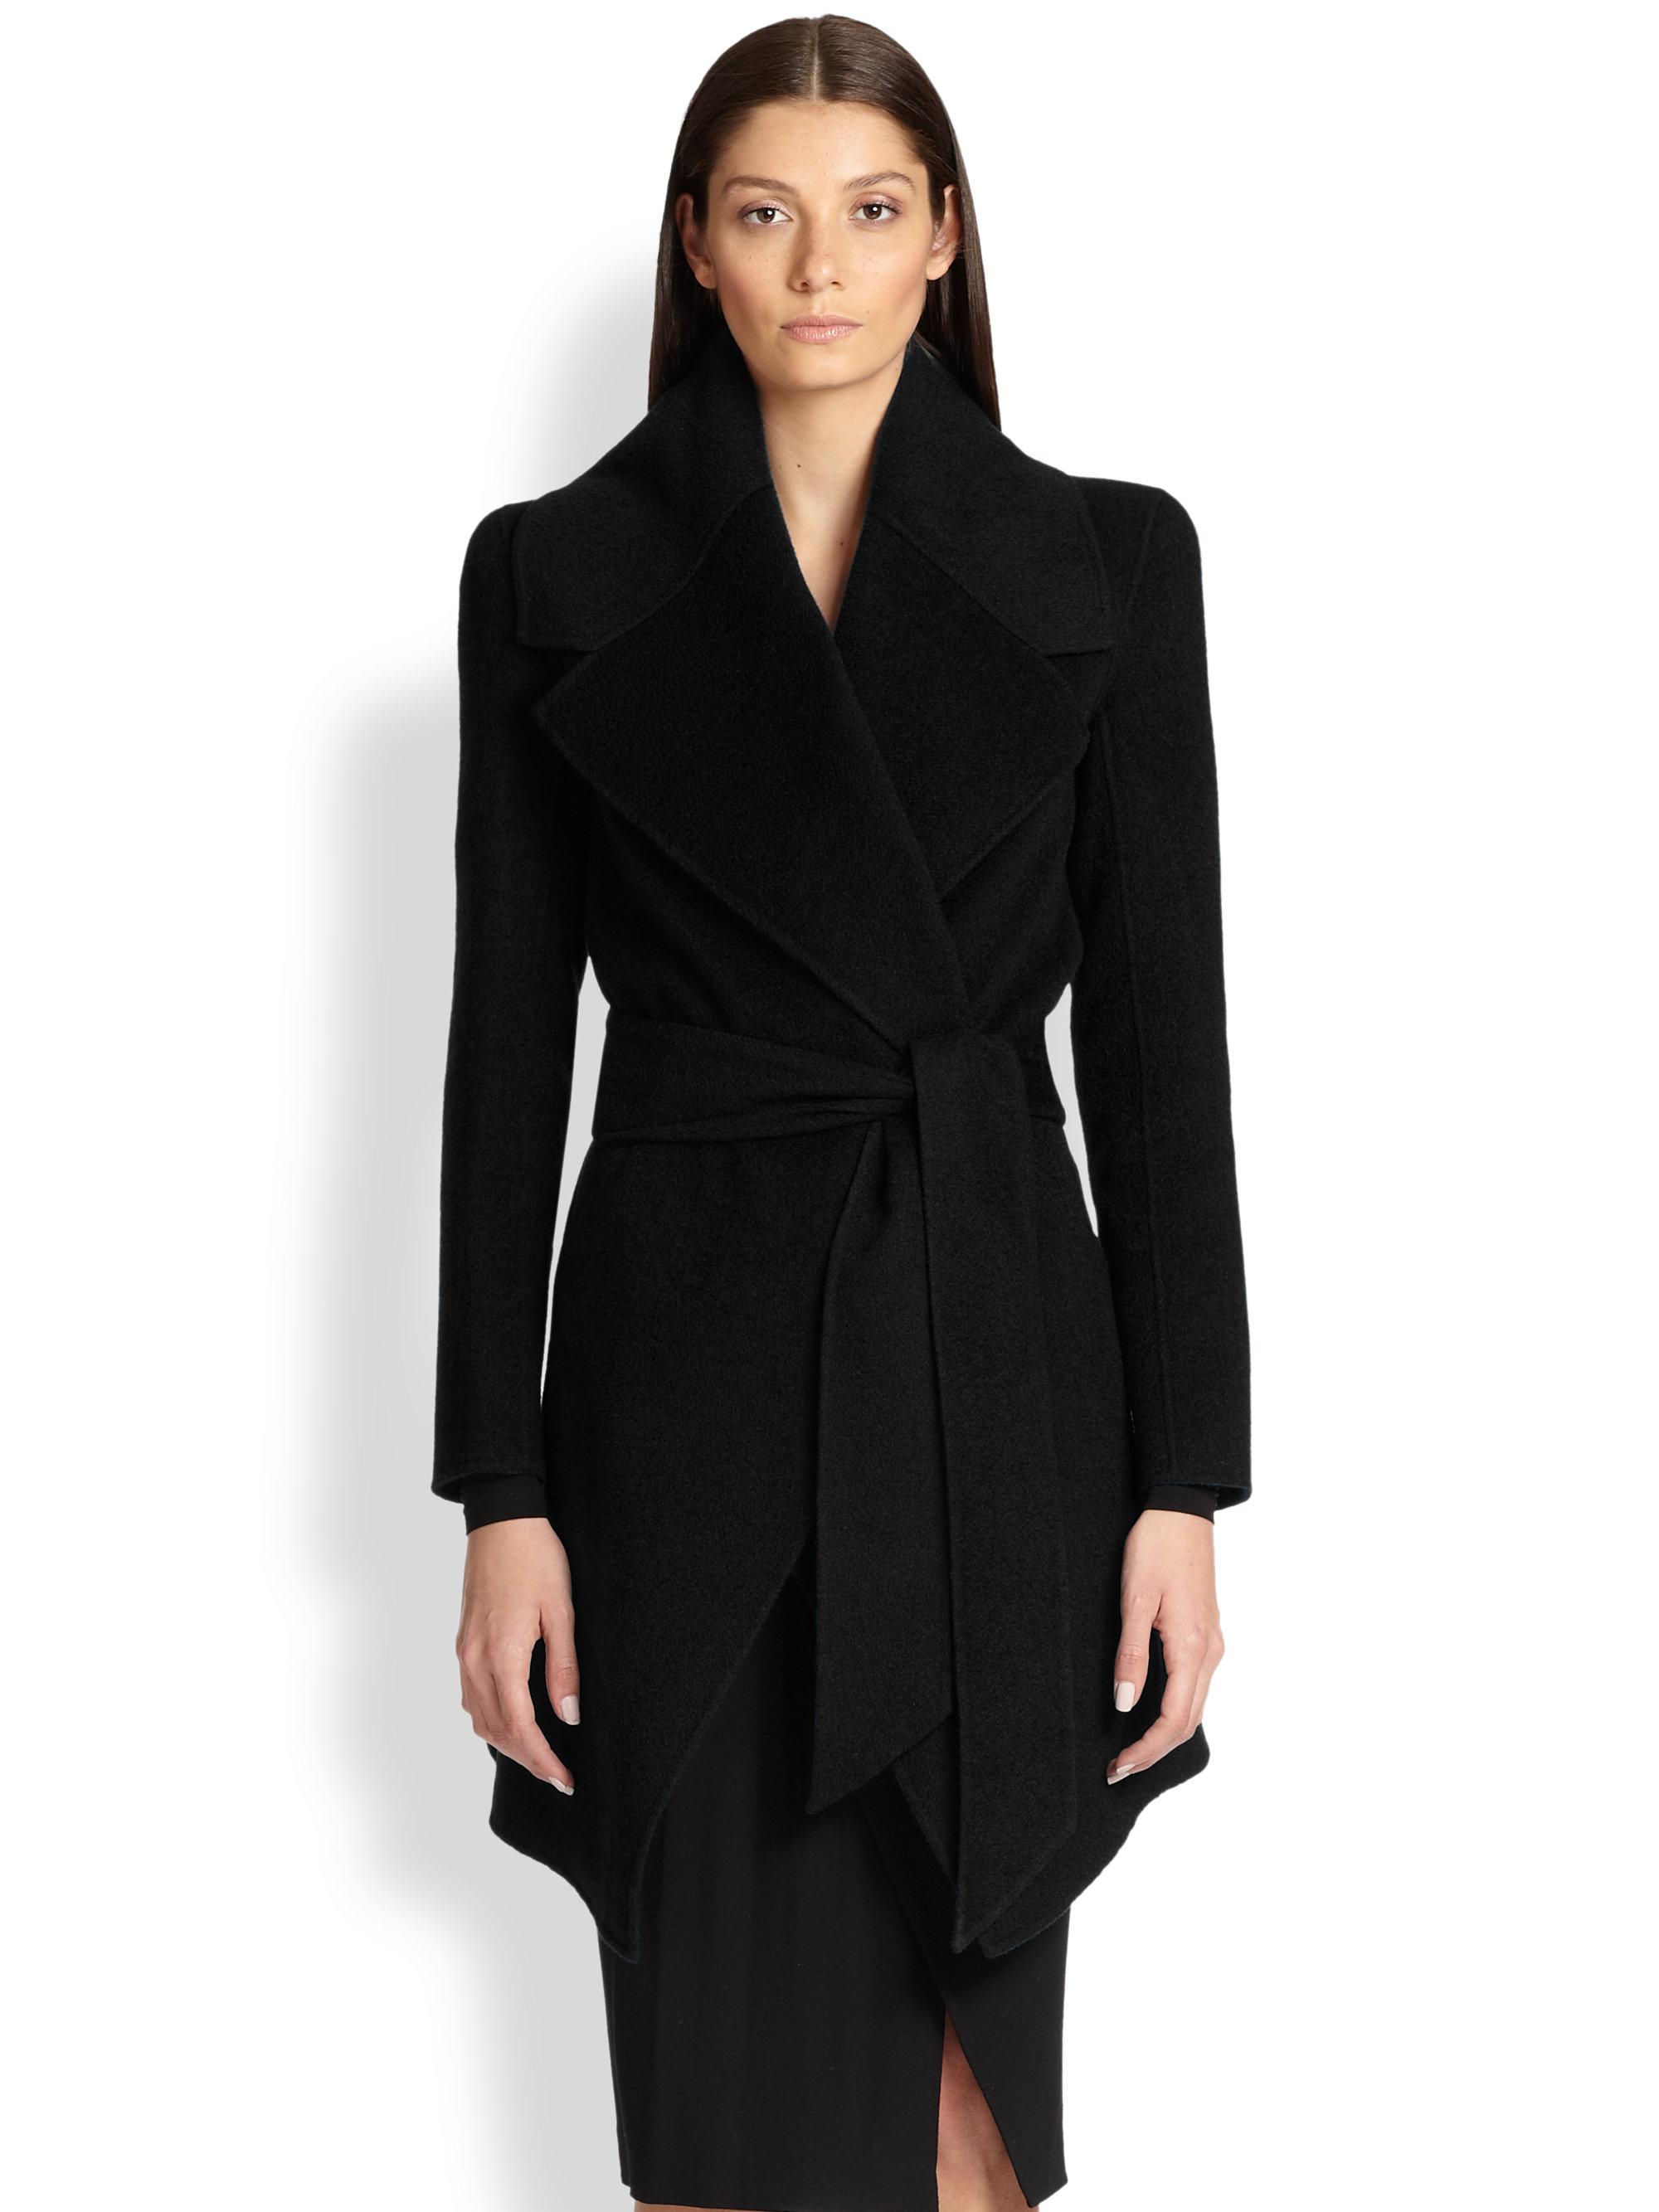 Donna karan Cashmere Wrap Coat in Black | Lyst